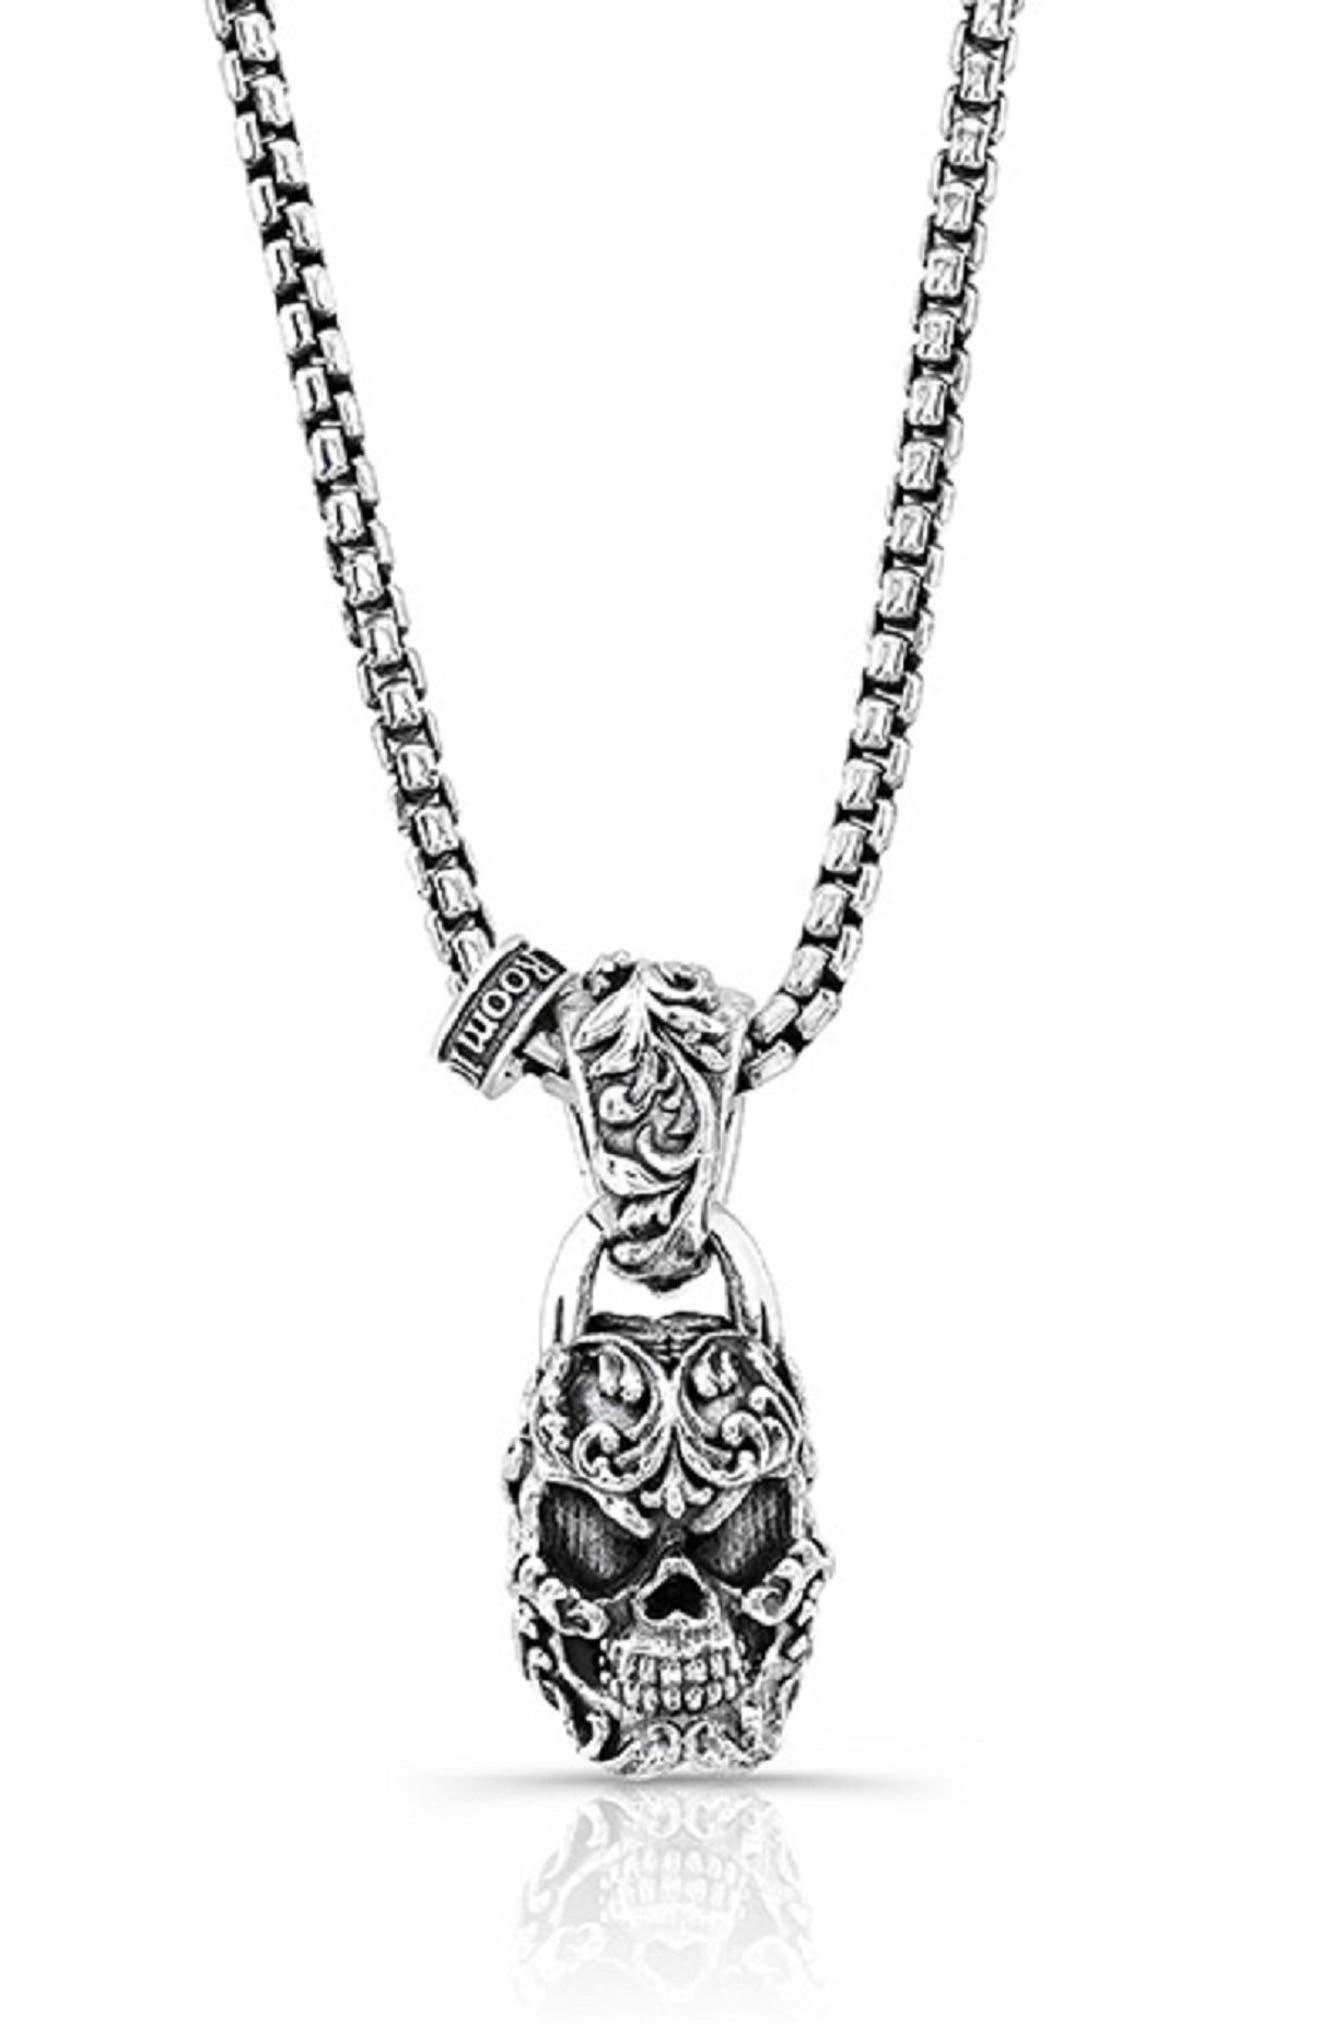 Room101 Filigree Skull Pendant Necklace